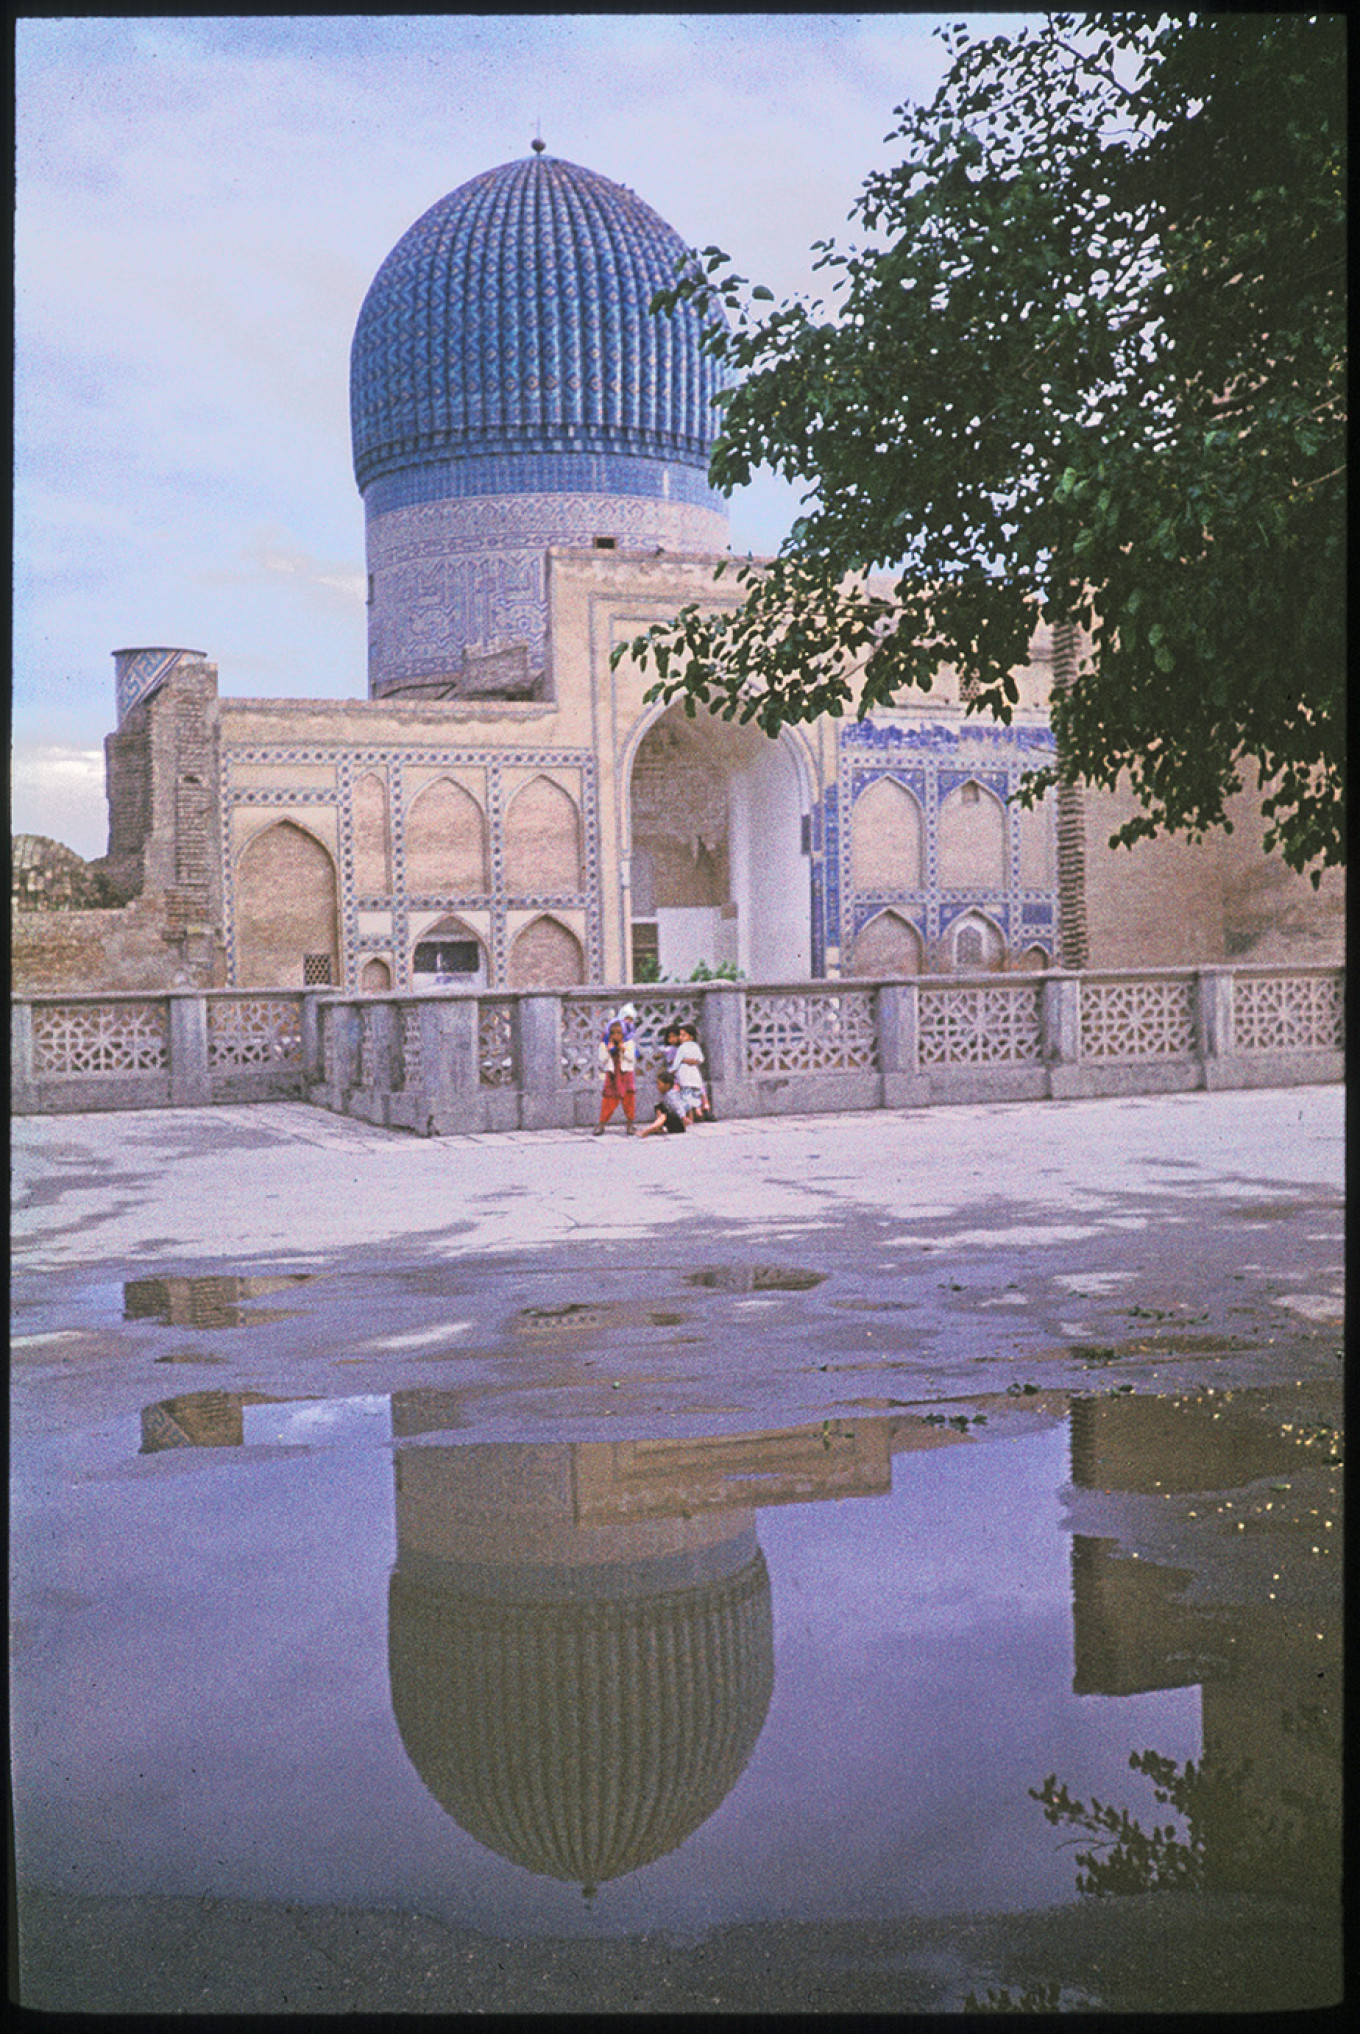 Gur Emir, Samarkand, west view after thunderstorm, May 1972. WC Brumfield/Duke University Press